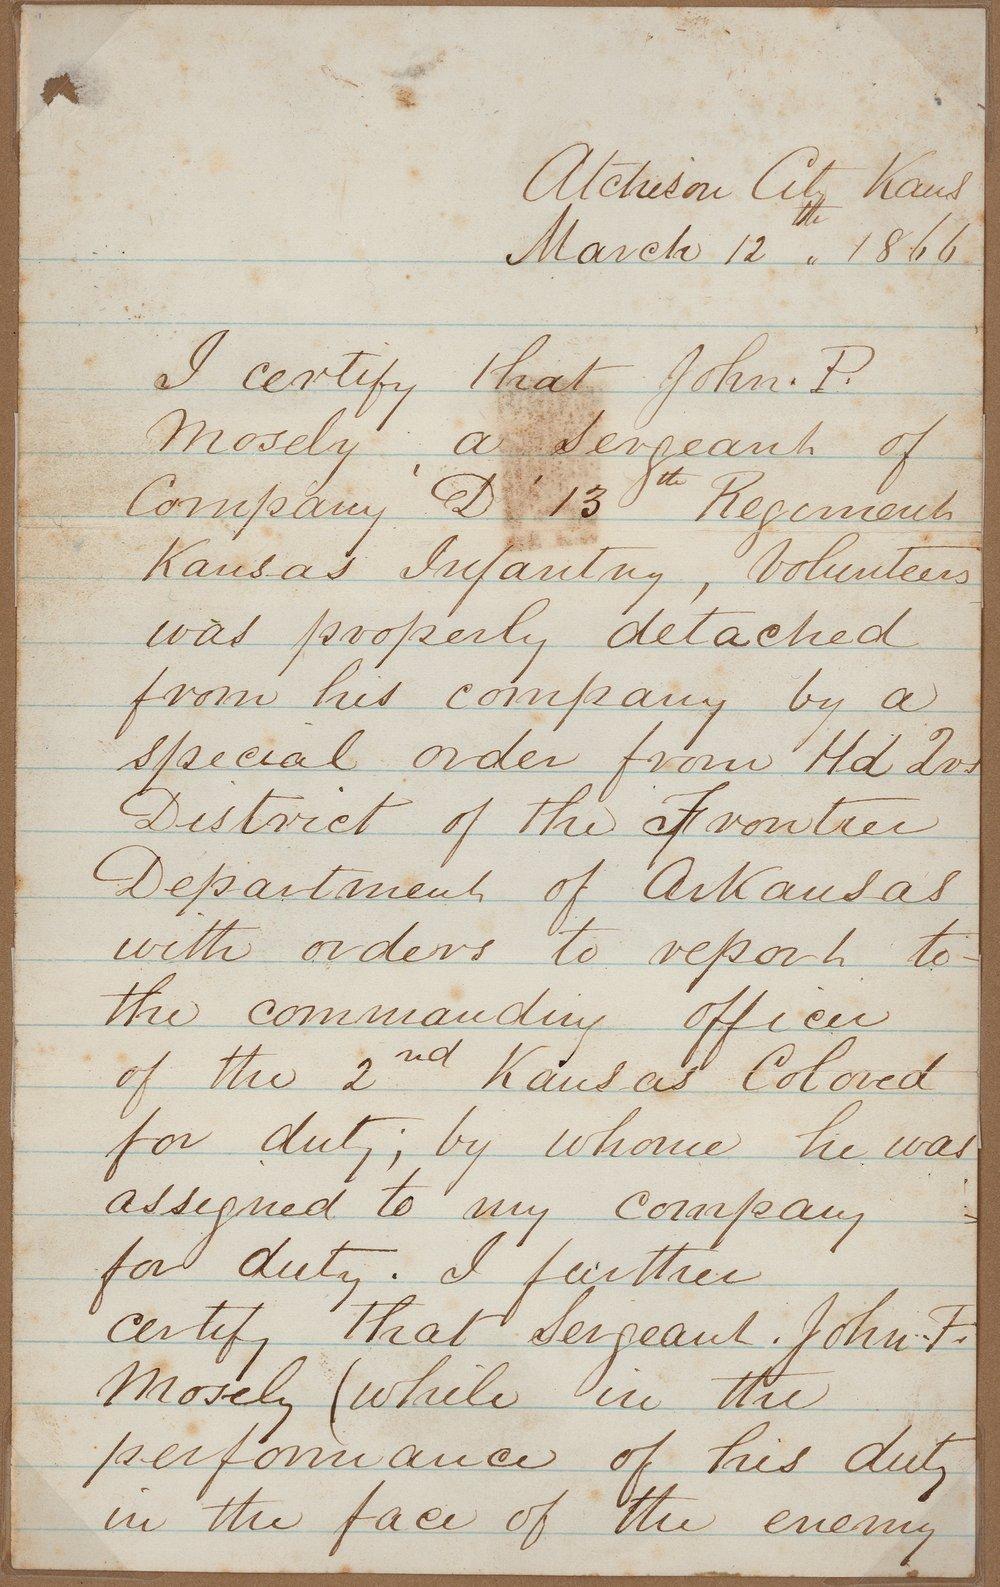 John M. Cain to Charles L. Mosley - 1